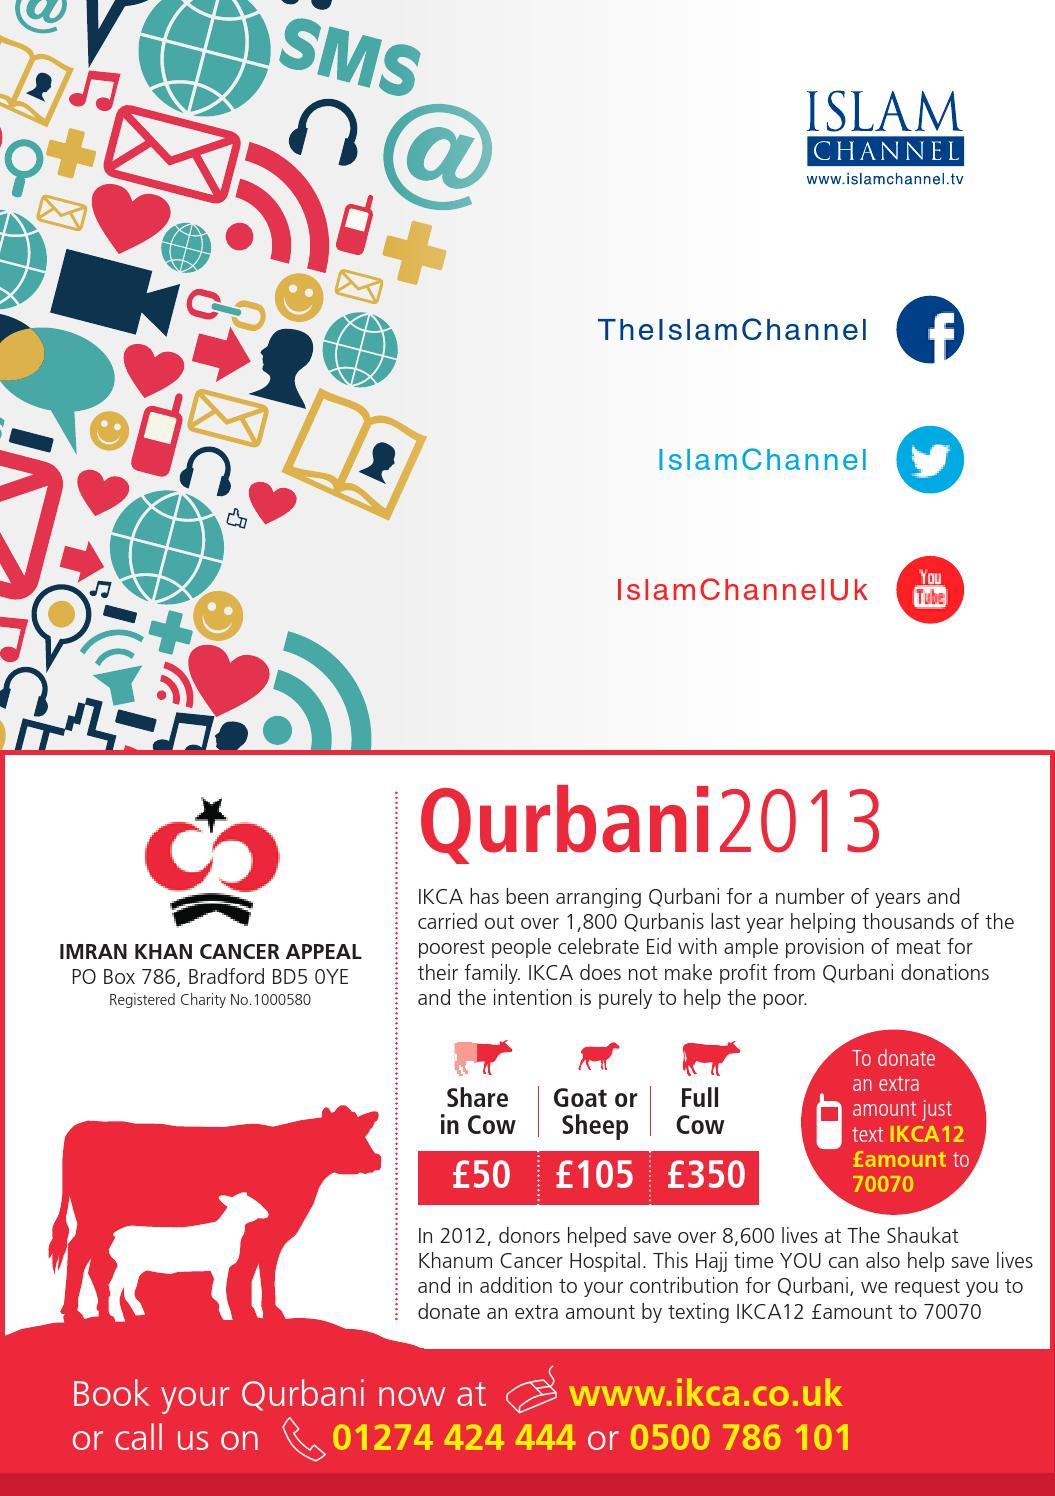 Islam Channel Hajj Brochure 2013 by Islam Channel - issuu